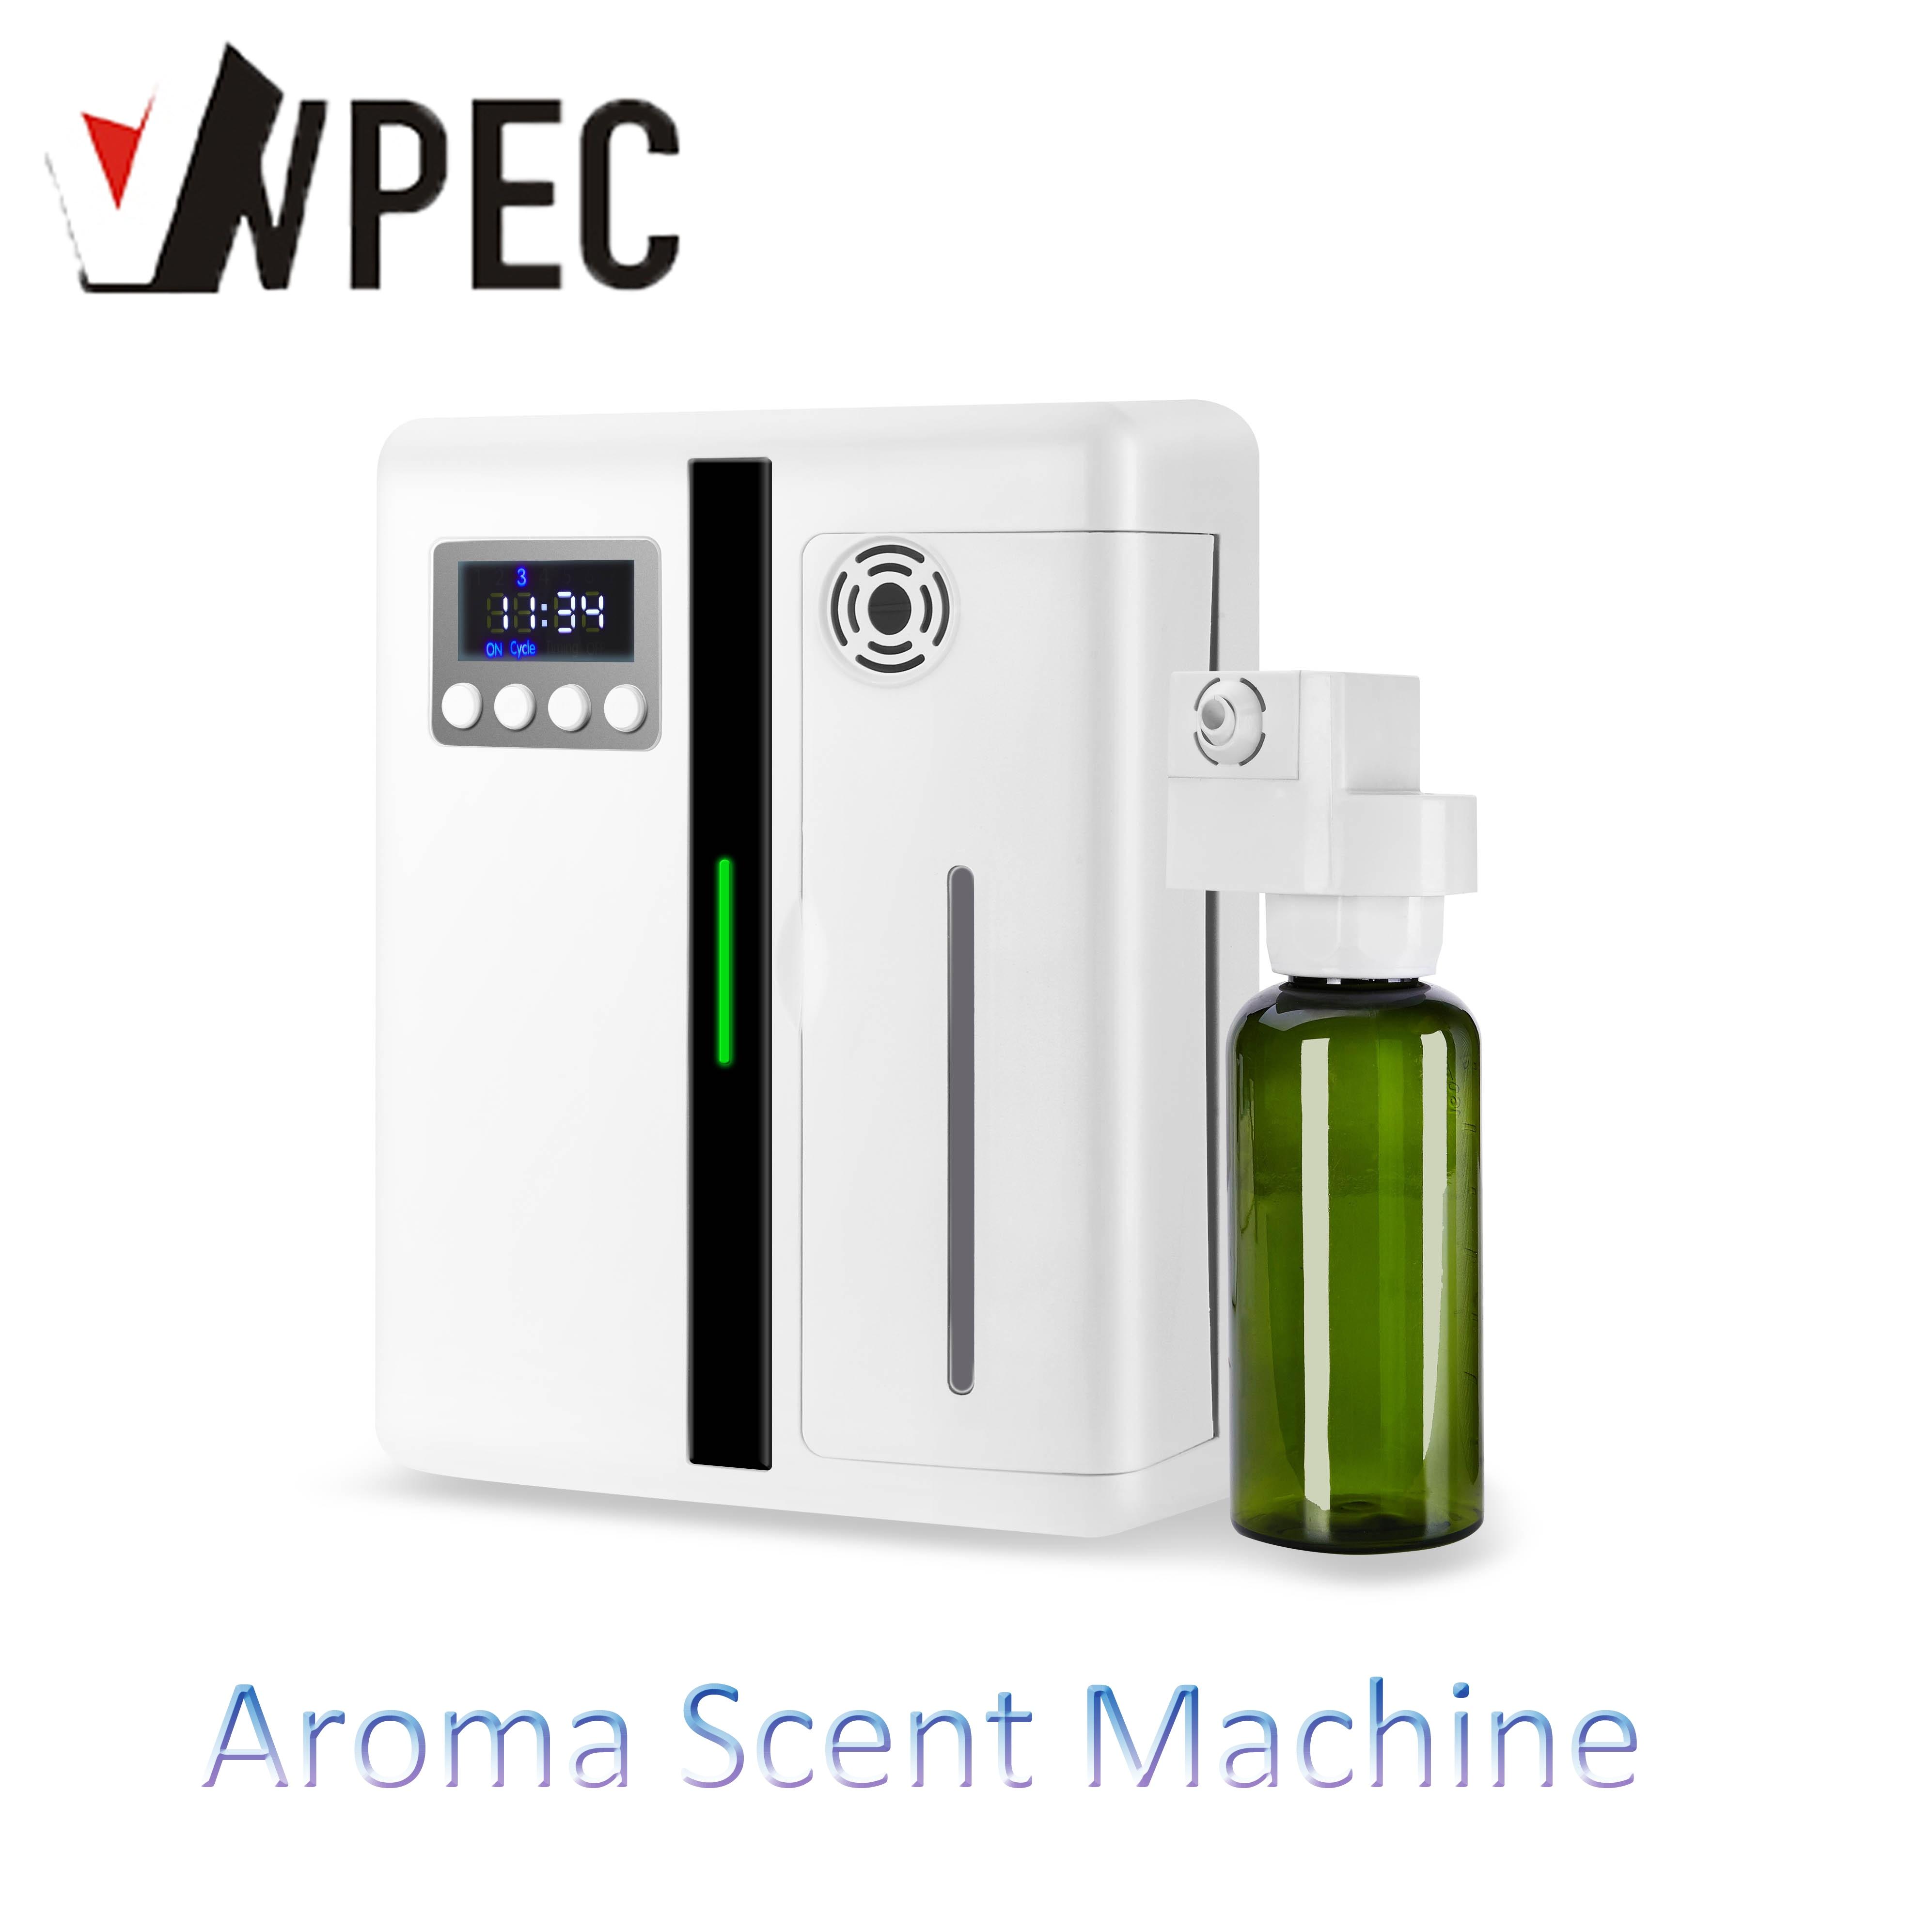 VVPEC, difusor de Aroma de 160ml, Unidad de Aroma Machine100m2, difusor de aceite esencial para Perfume KTV comercial de negocios de Hotel